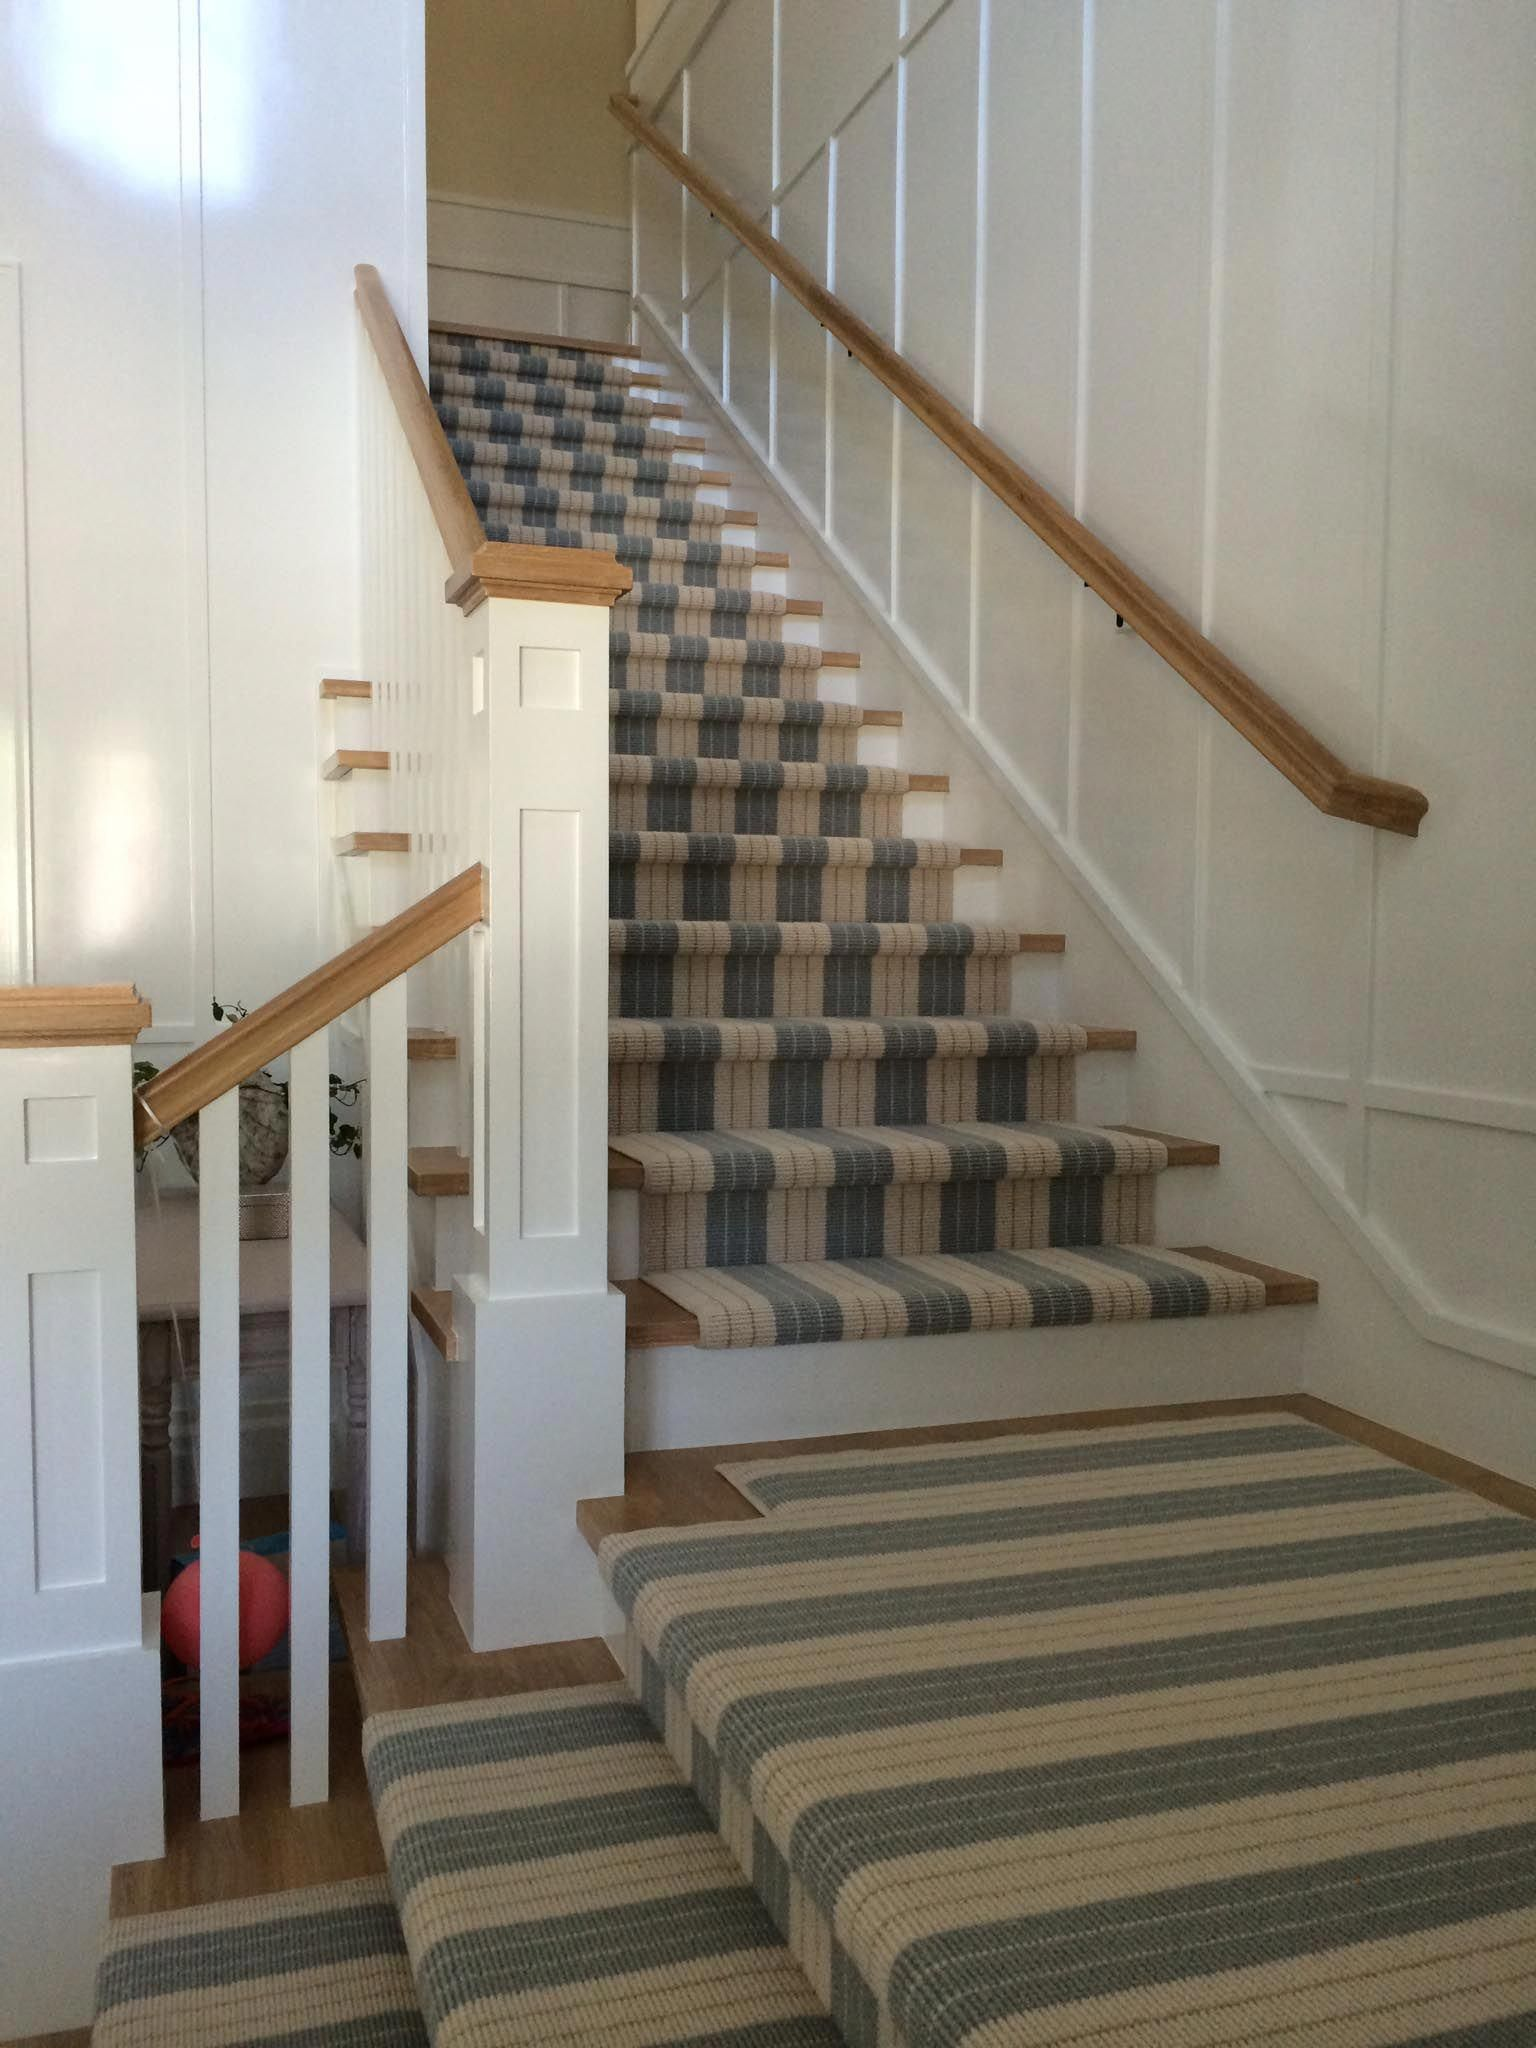 Where To Plastic Carpet Runners Striped Stair Runner